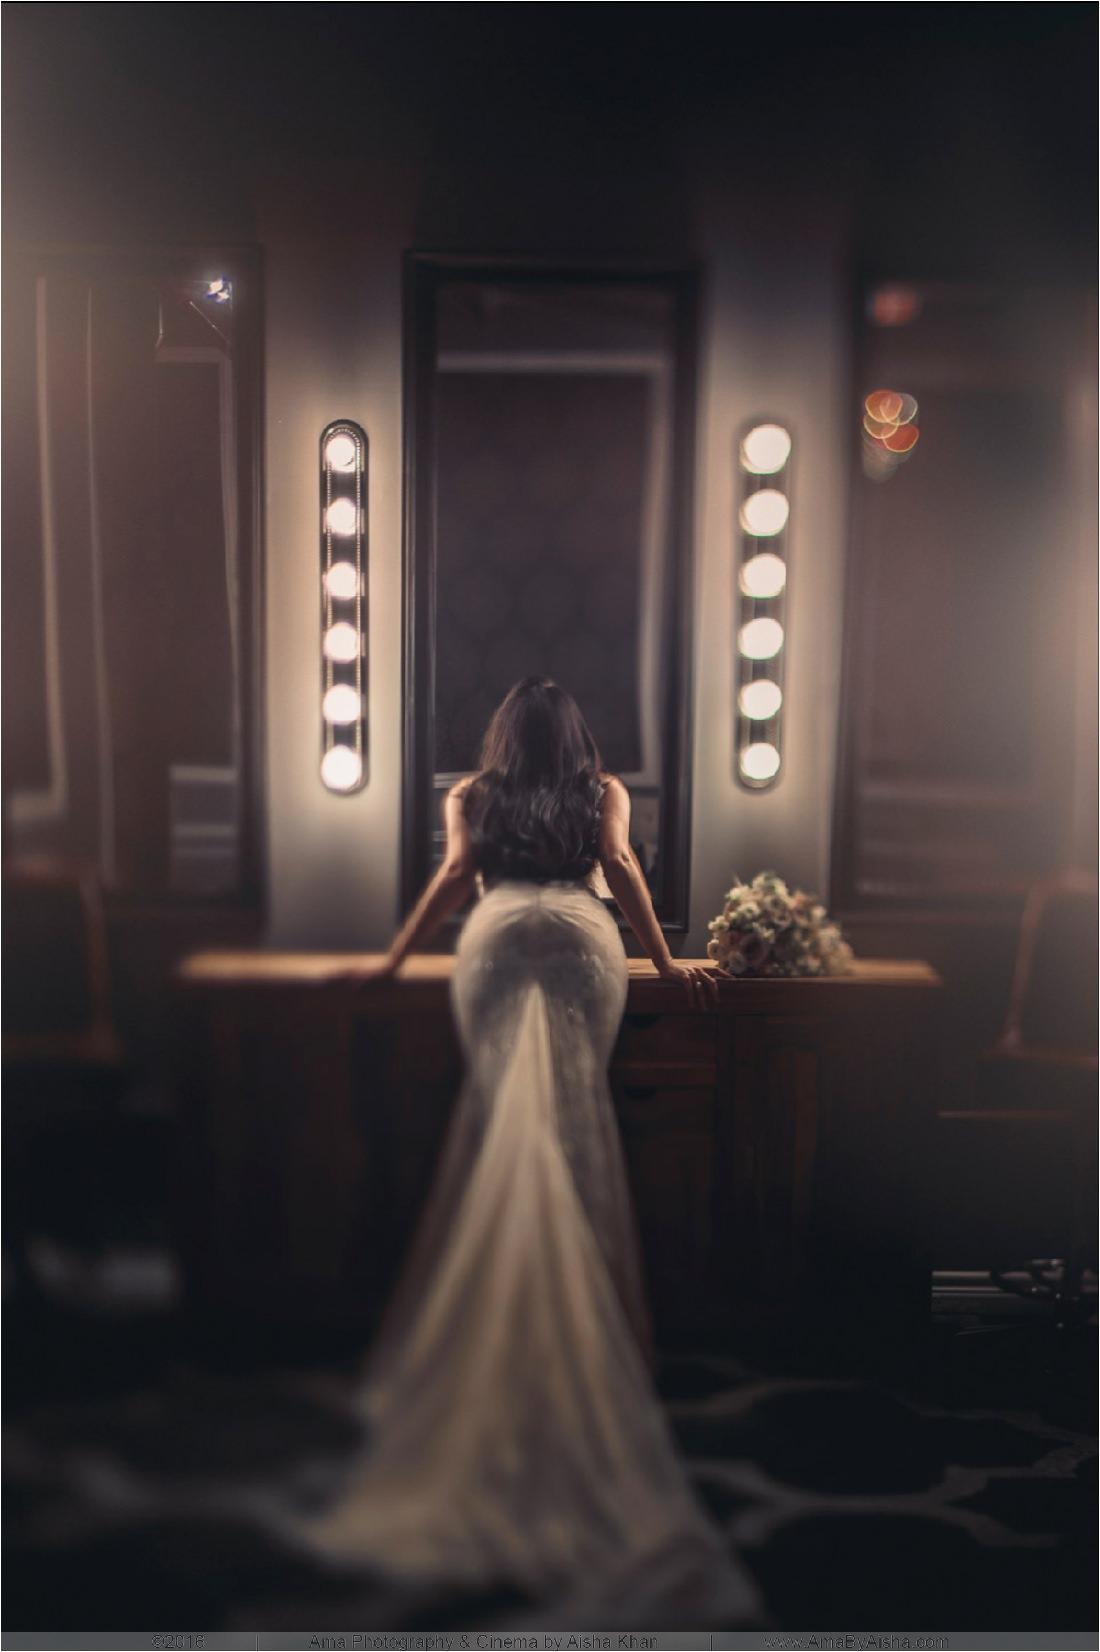 Wedding photography. Bride getting ready